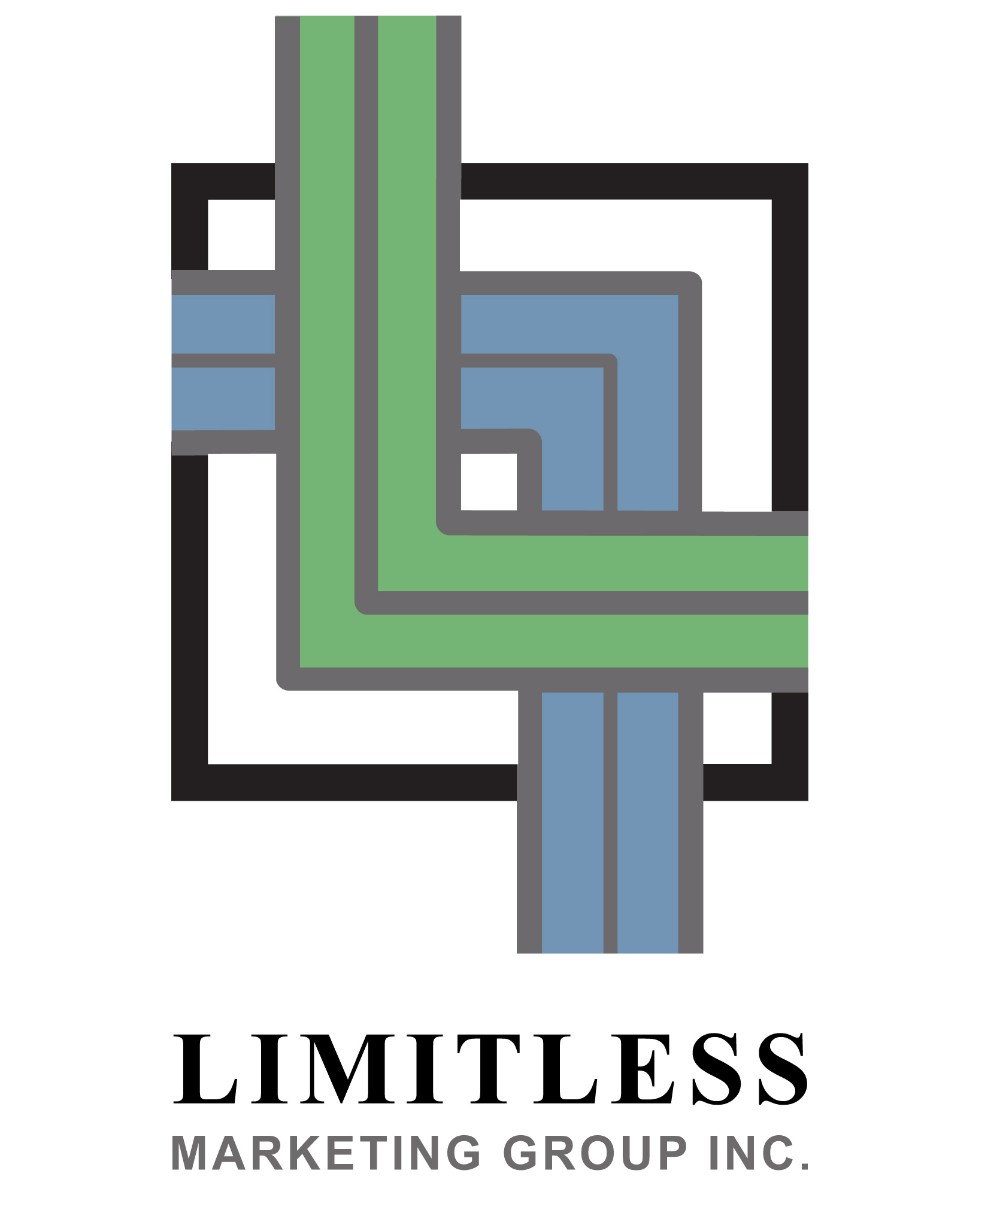 Limitless Marketing Group Inc - Logo